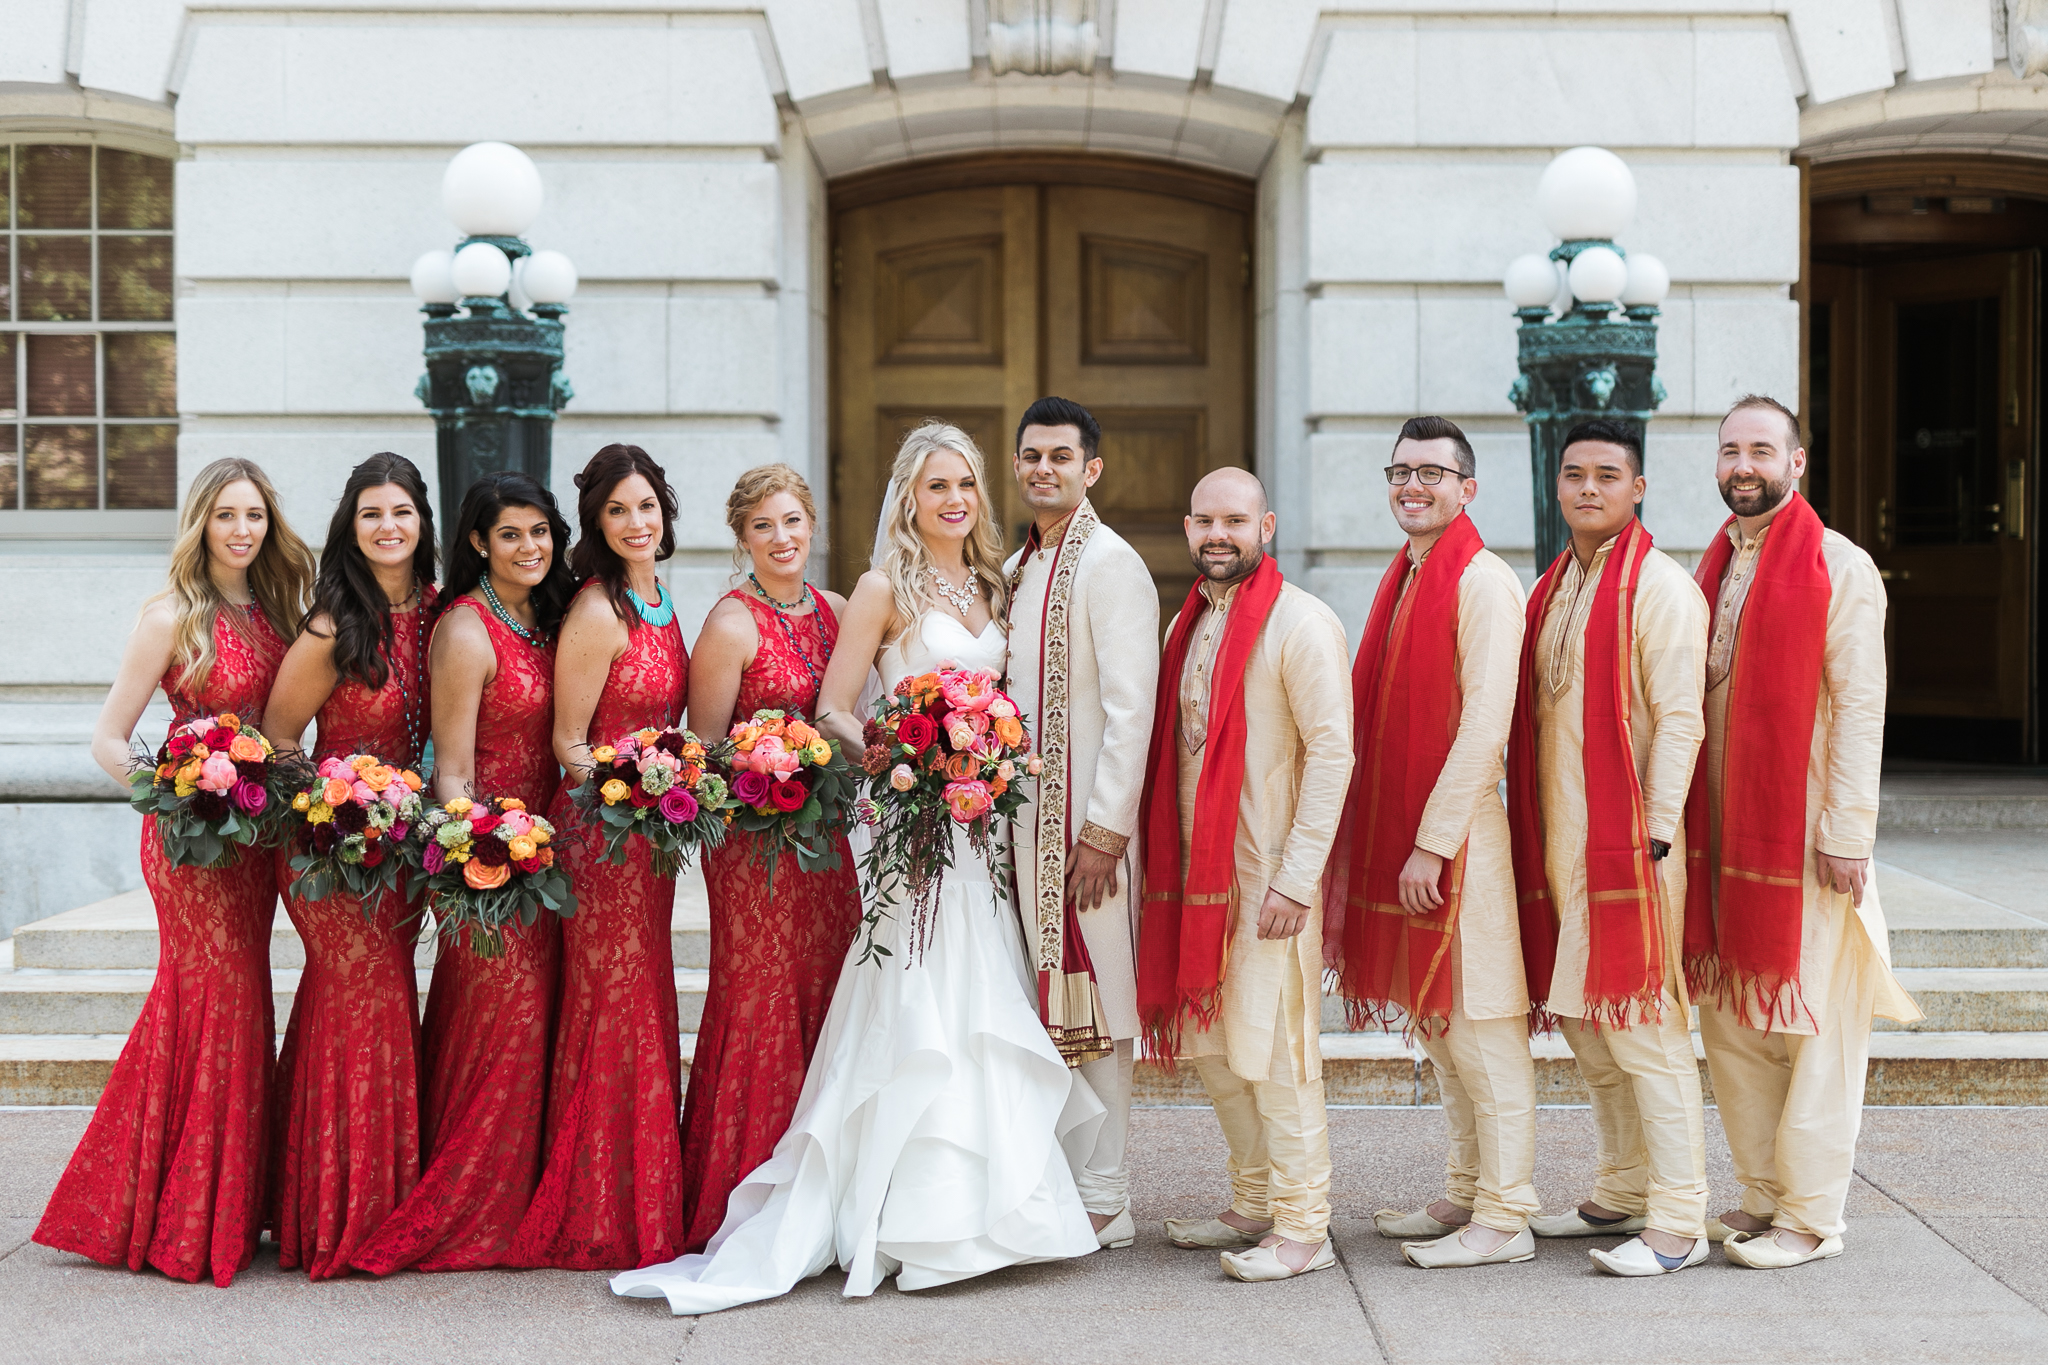 Indian-Fusion-wedding-Madison-Wisconsin_047.jpg